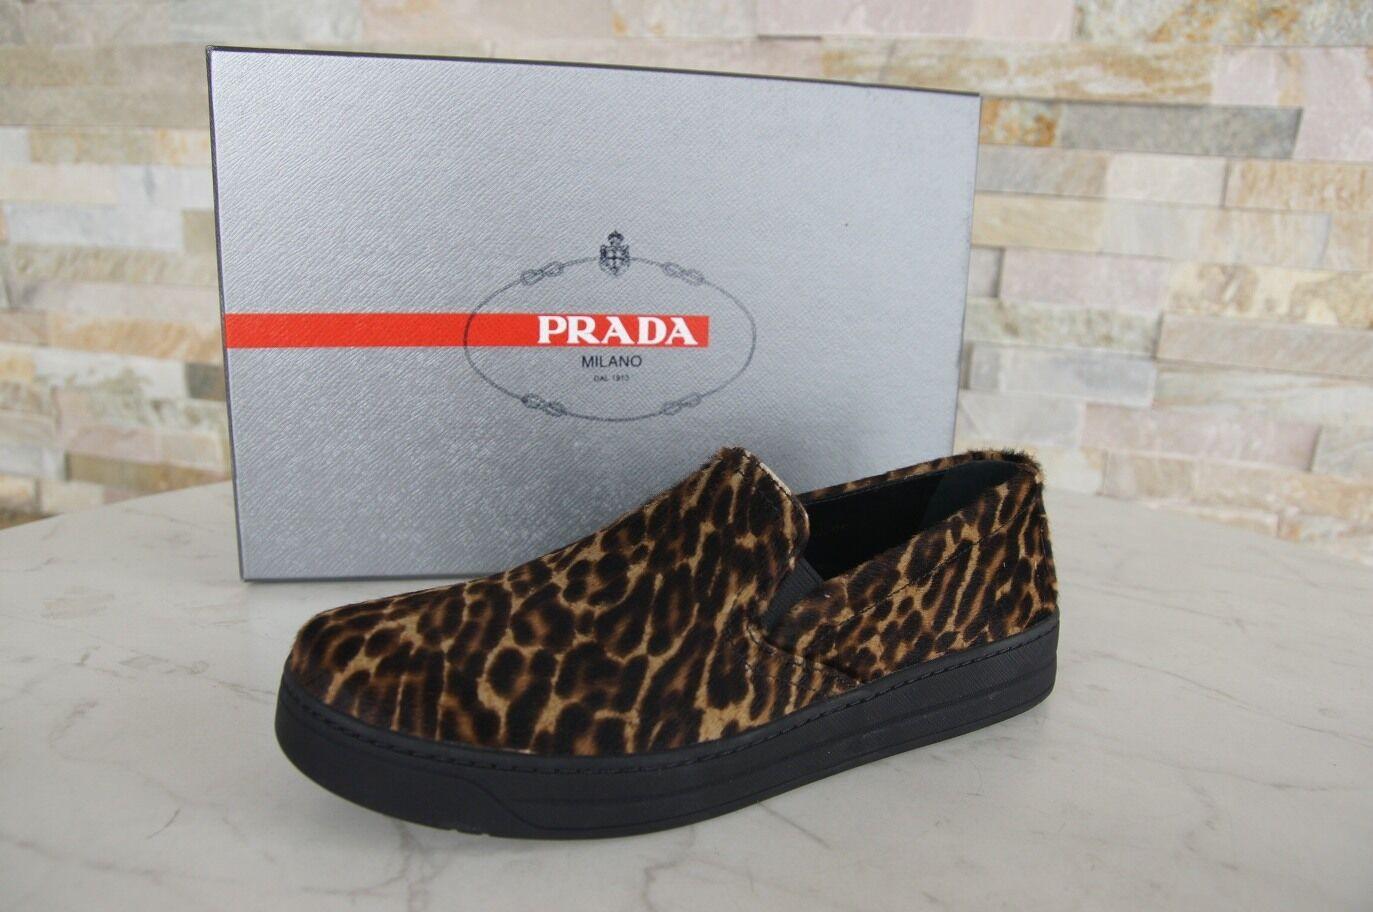 PRADA Gr 36,5 Slipper Mokassins Slip-Ons Schuhe Leopard Kalb NEU ehem.